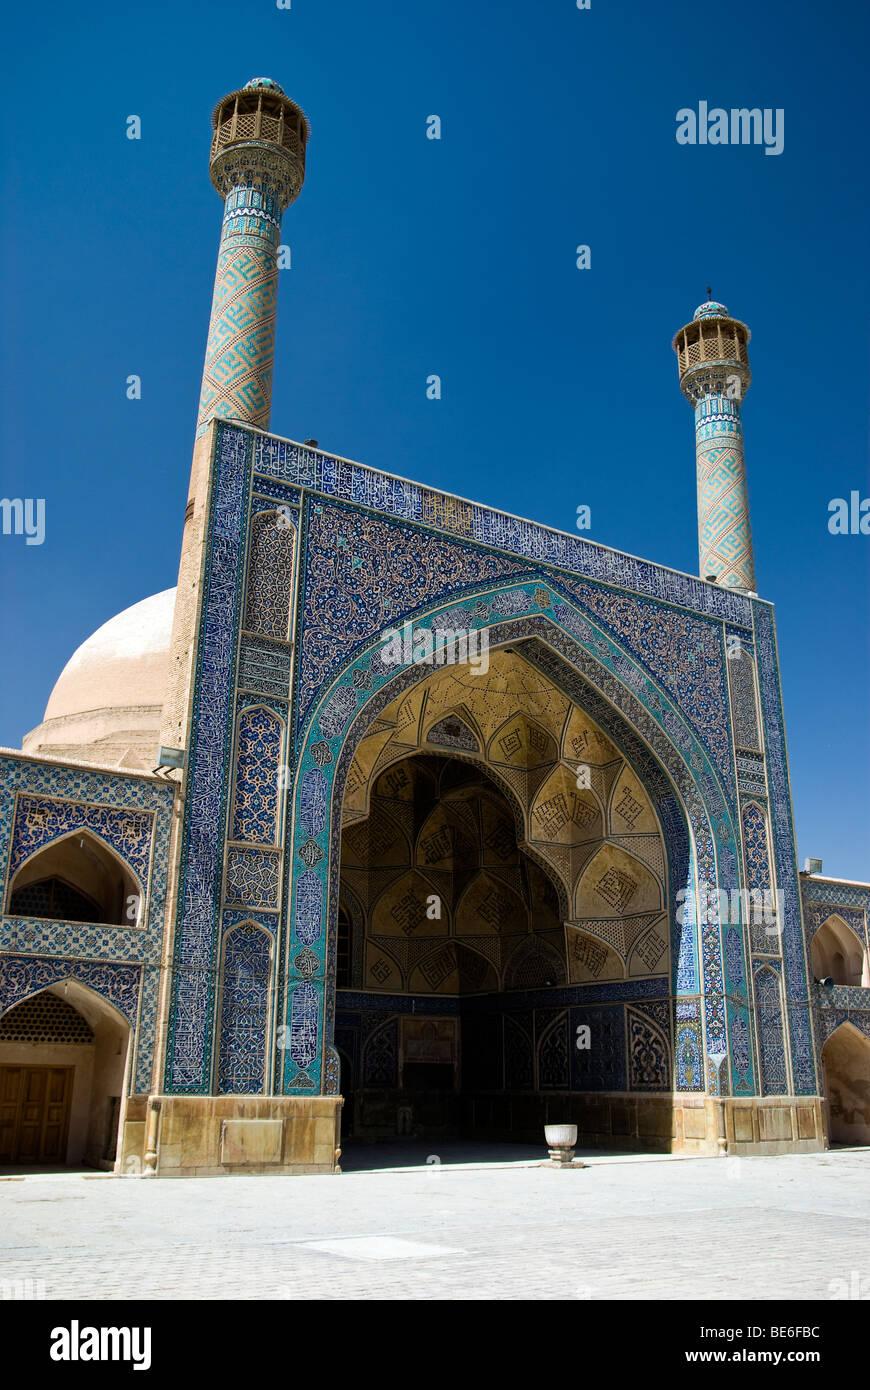 L'entrée principale de la mosquée Jameh (iwan), Ispahan, Iran Photo Stock